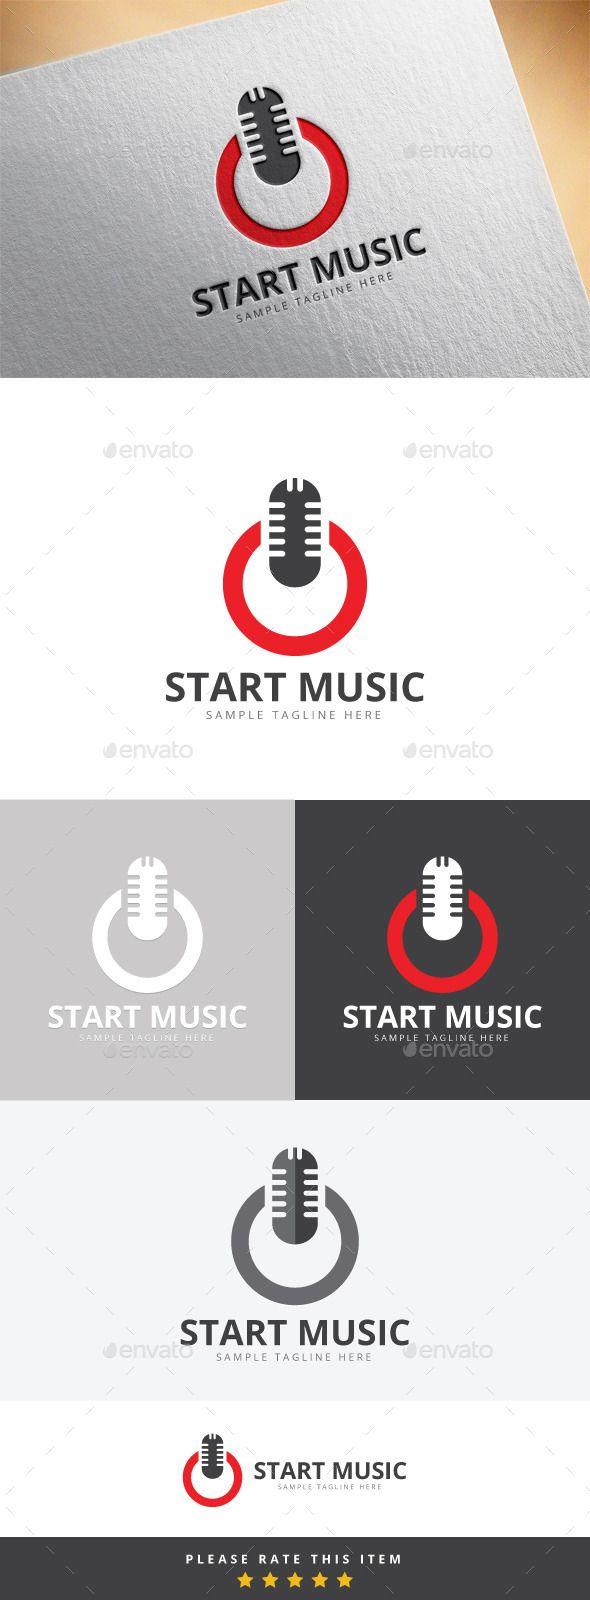 Power Music Logo — Vector EPS #corporate #modern • Available here → https://graphicriver.net/item/power-music-logo/10169949?ref=pxcr